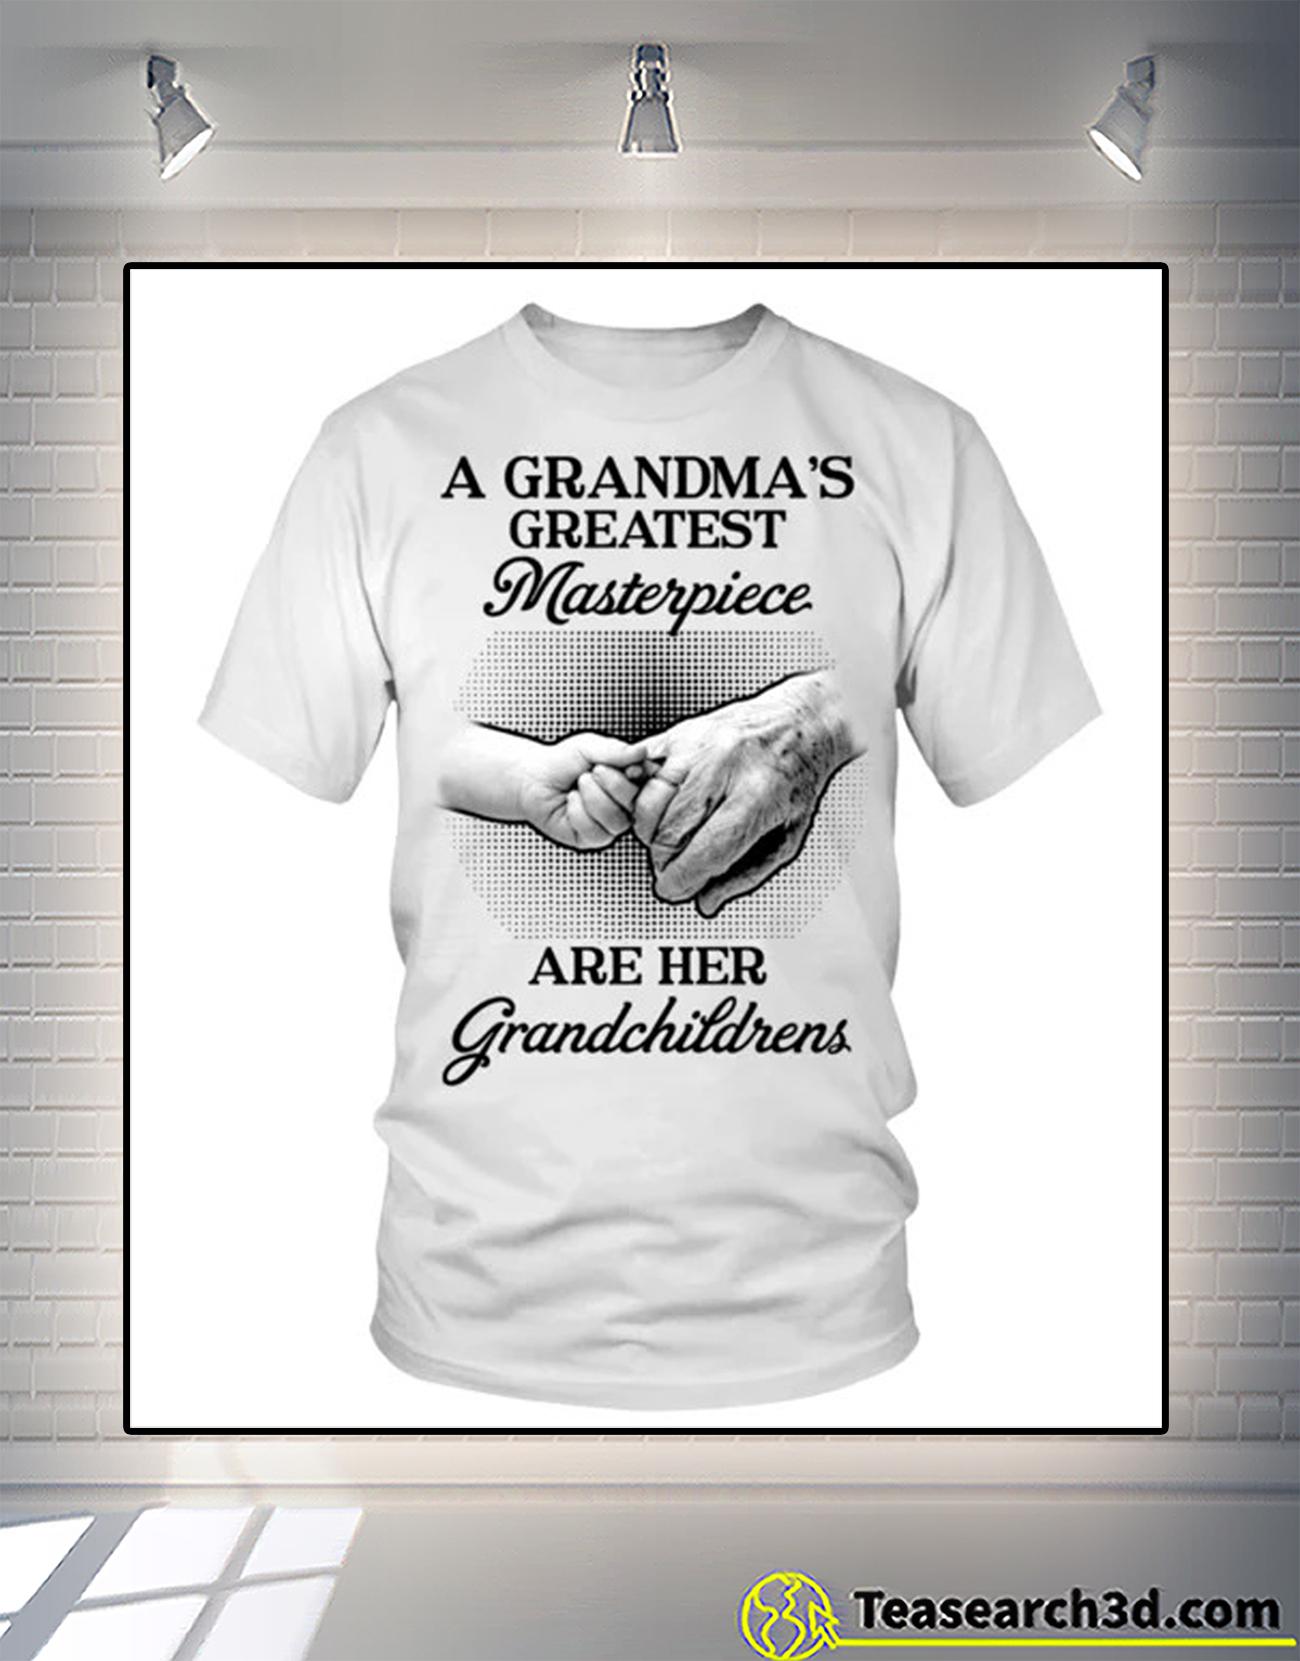 A grandma's greatest masterpiece are her grandchildrens shirt 1